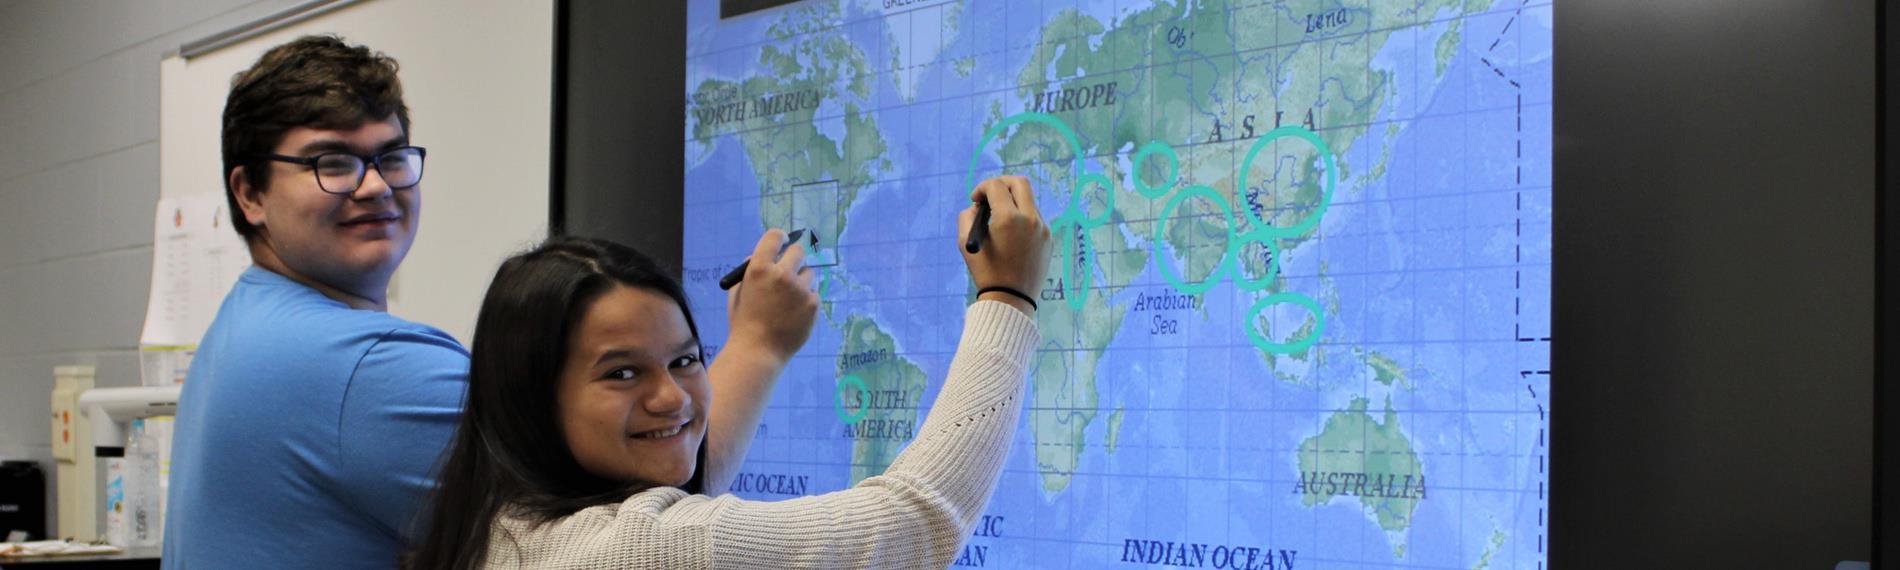 Students at OHS using Interactive Display